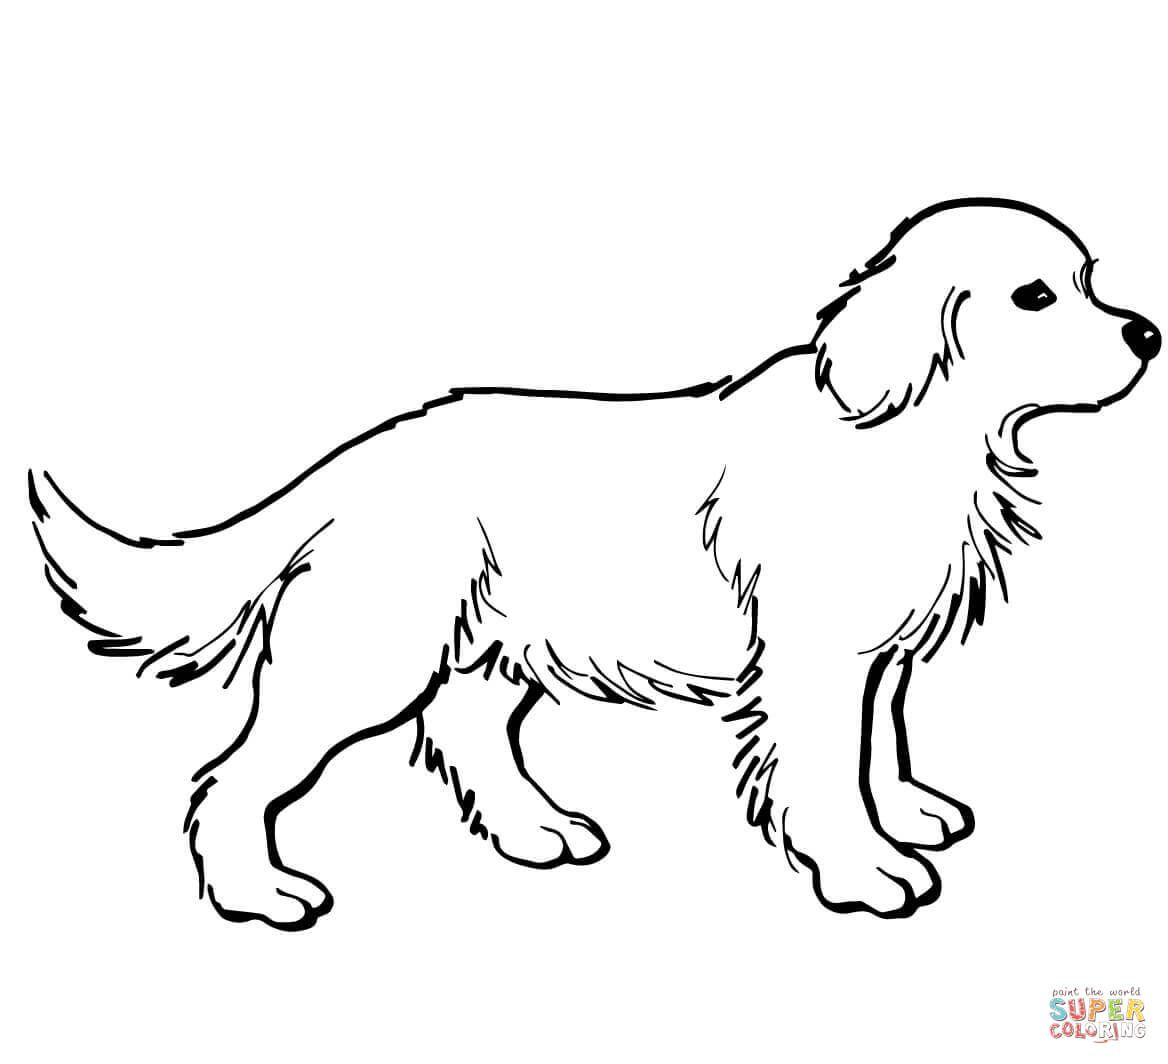 Labrador Retriever Coloring Page Free Printable Coloring Pages Dog Coloring Page Dog Pictures To Color Puppy Coloring Pages